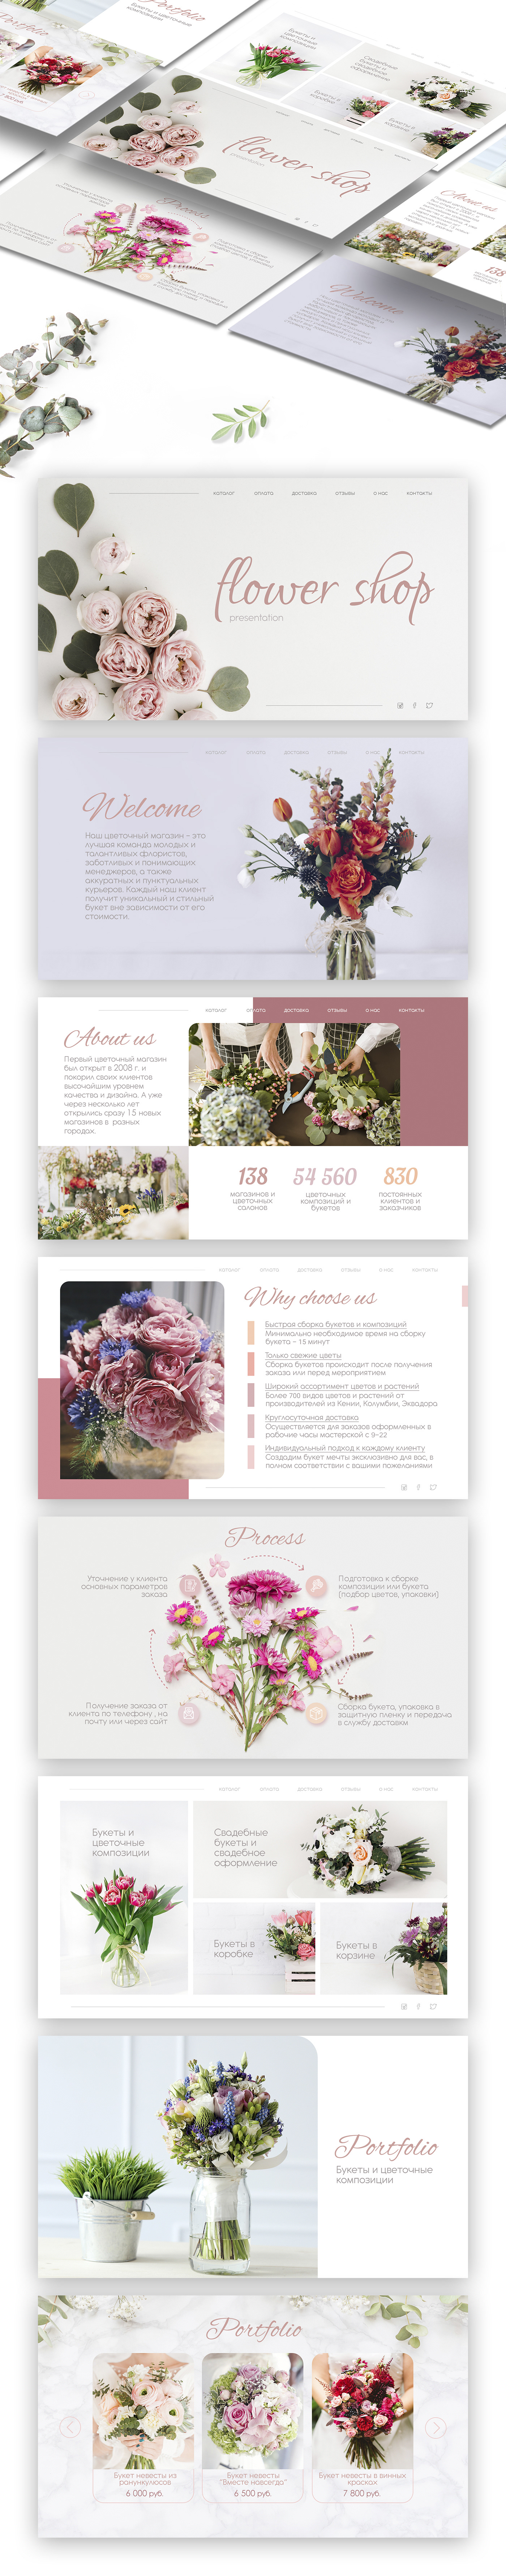 design flower Flower Shop power point PPT presentation Style дизайн презентация цветочный магазин